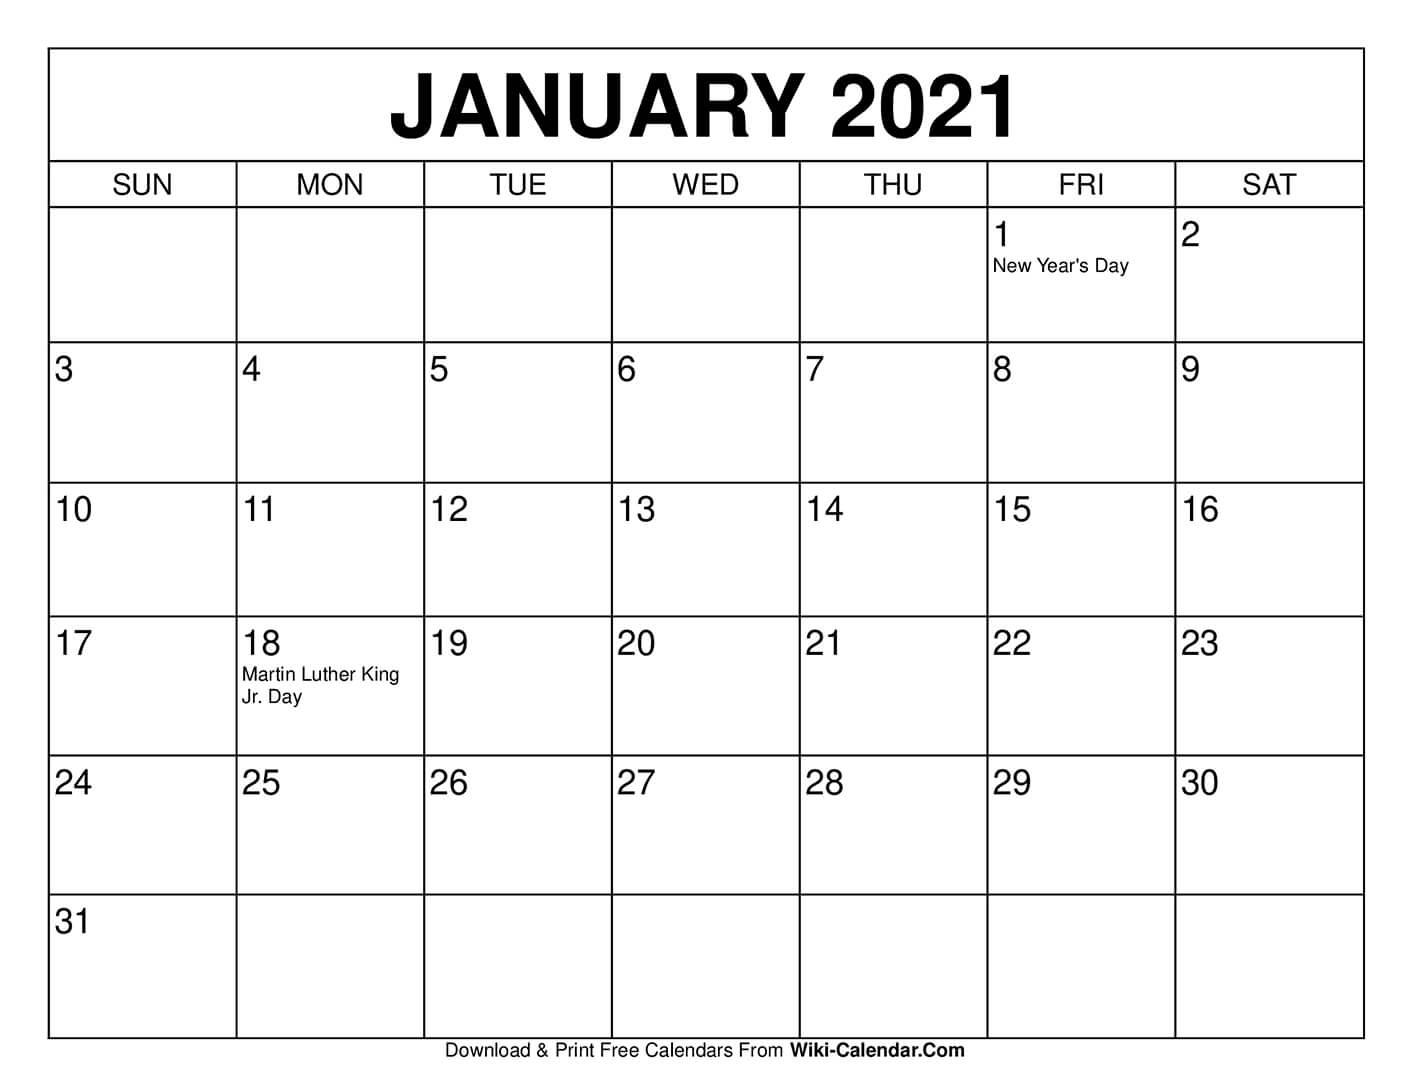 Printable Calendar For January 2021